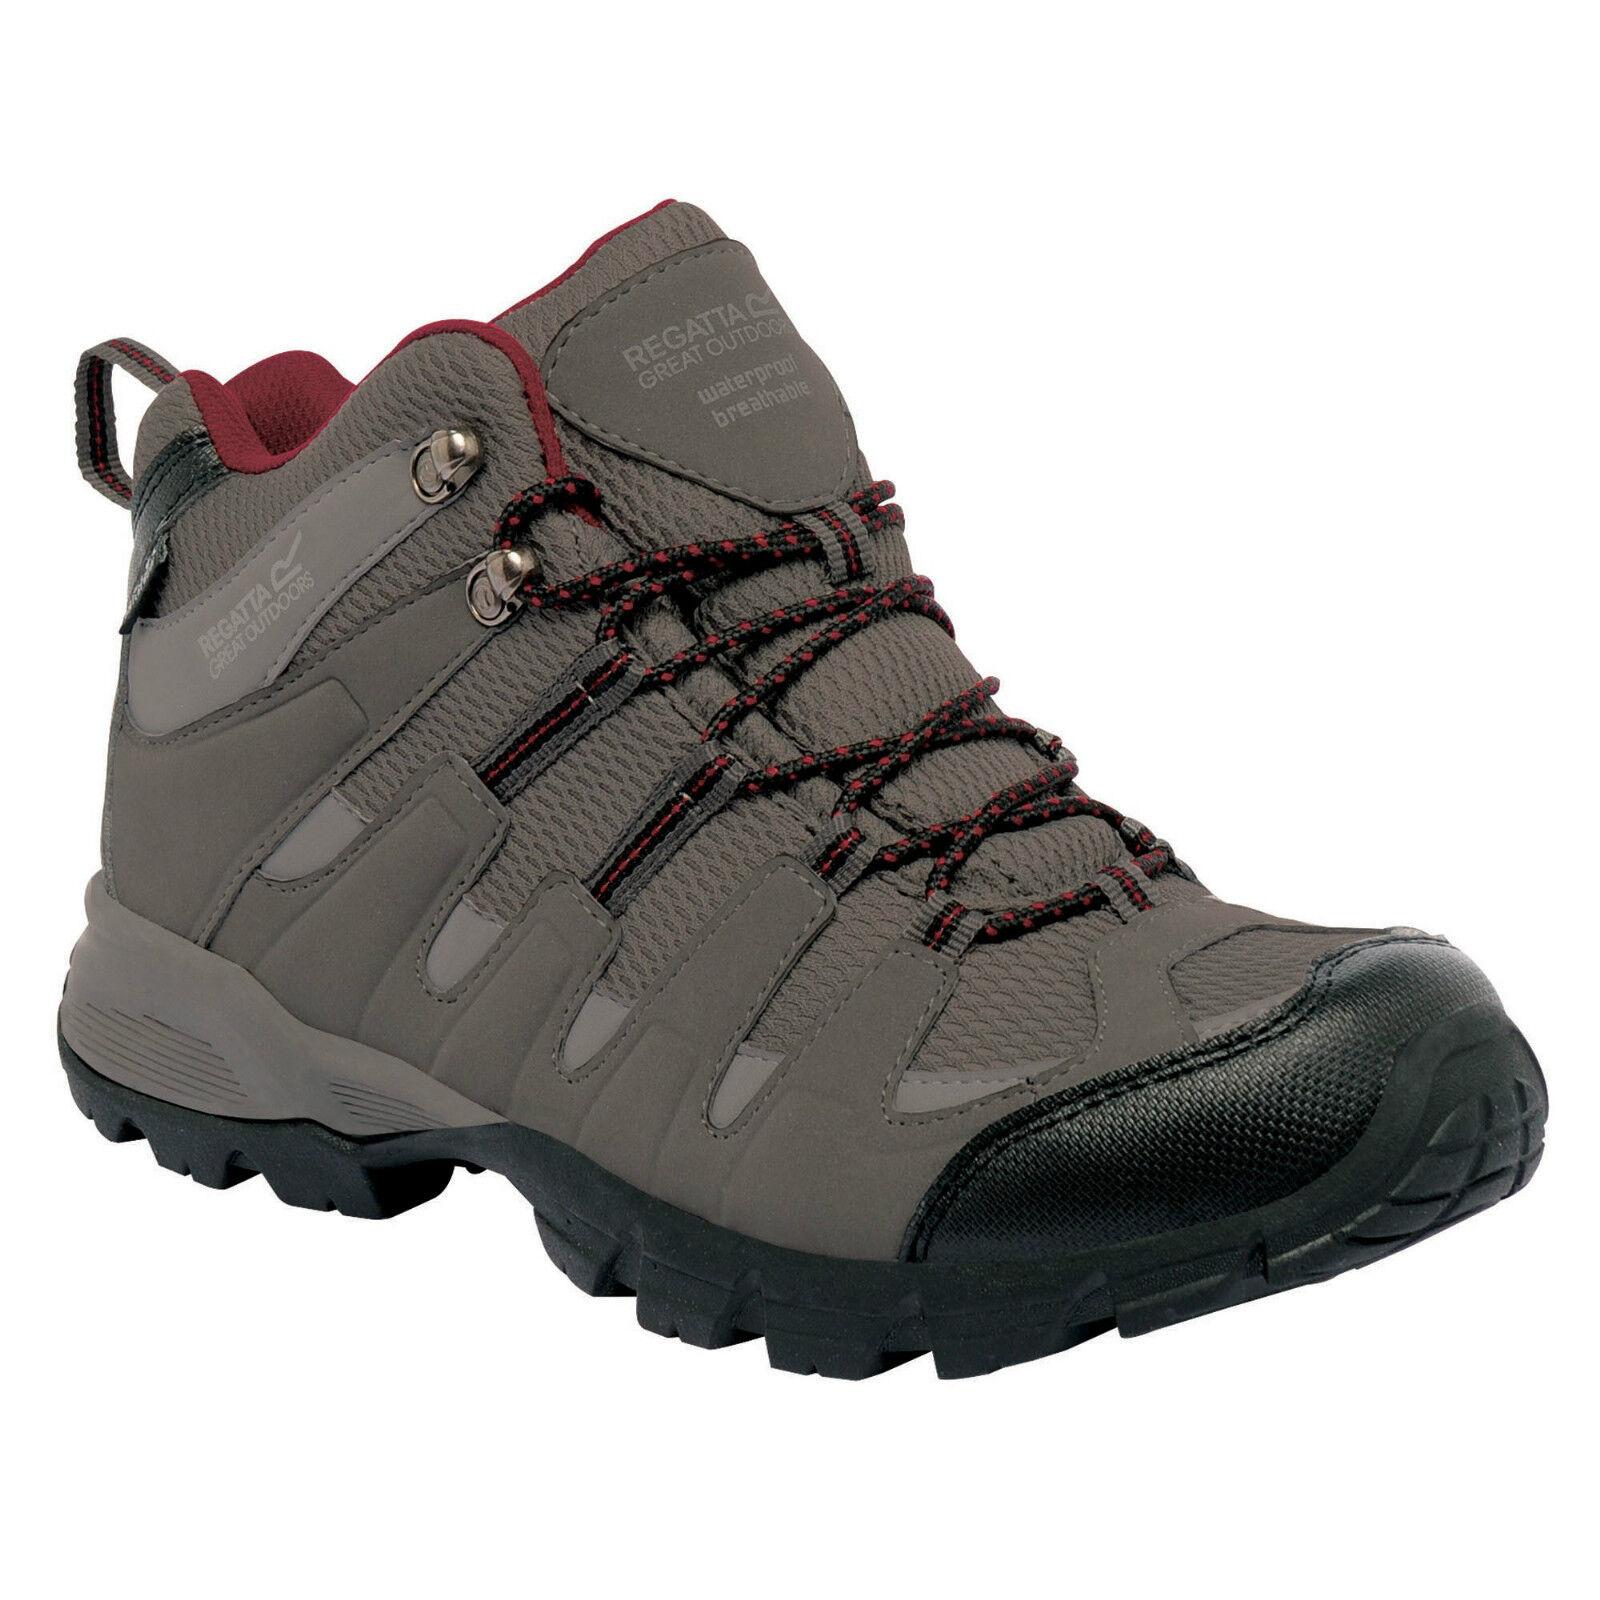 REGATTA MENS GARSDALE MID WALKING TRAIL BOOT CHARCOAL GREY RHUBARB RED RMF340